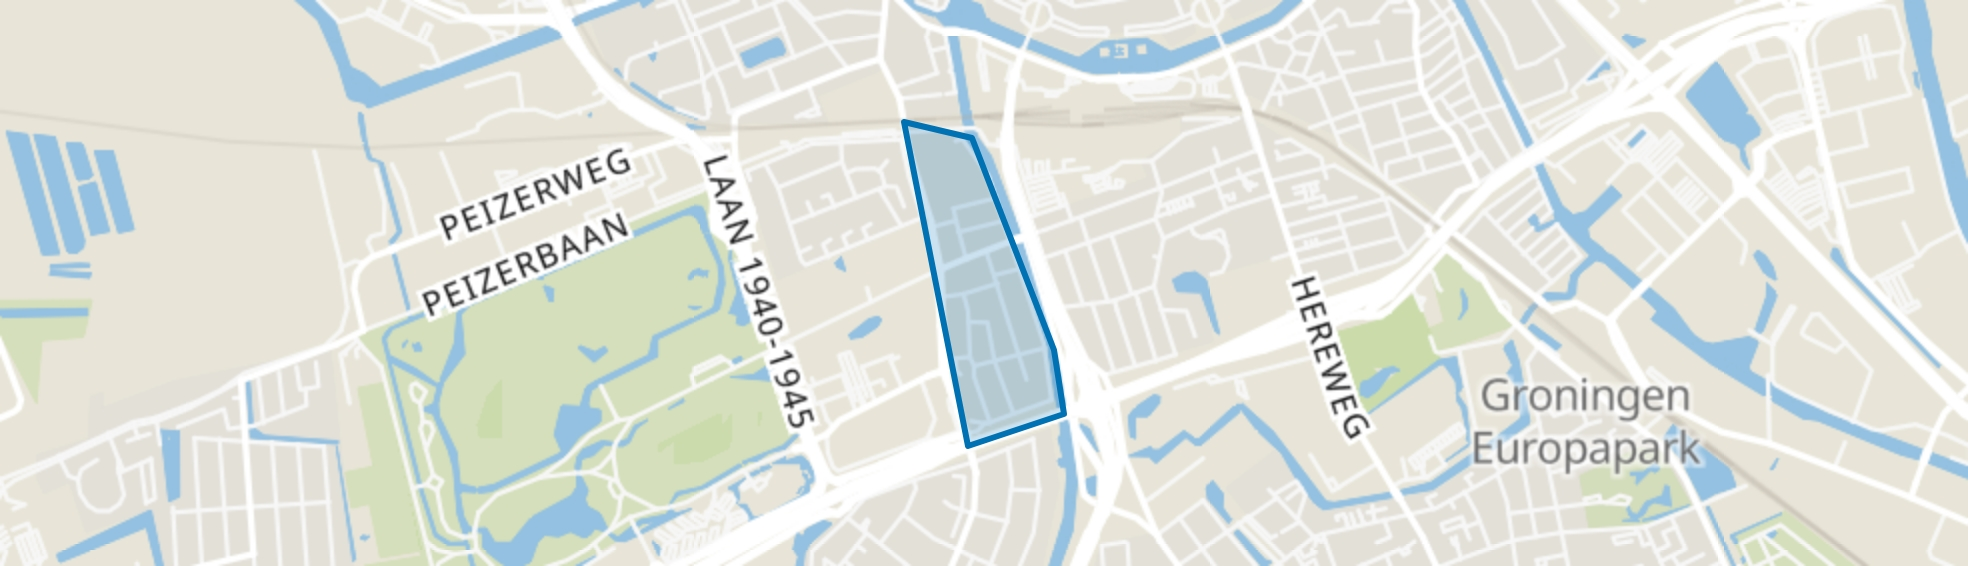 Grunobuurt, Groningen map